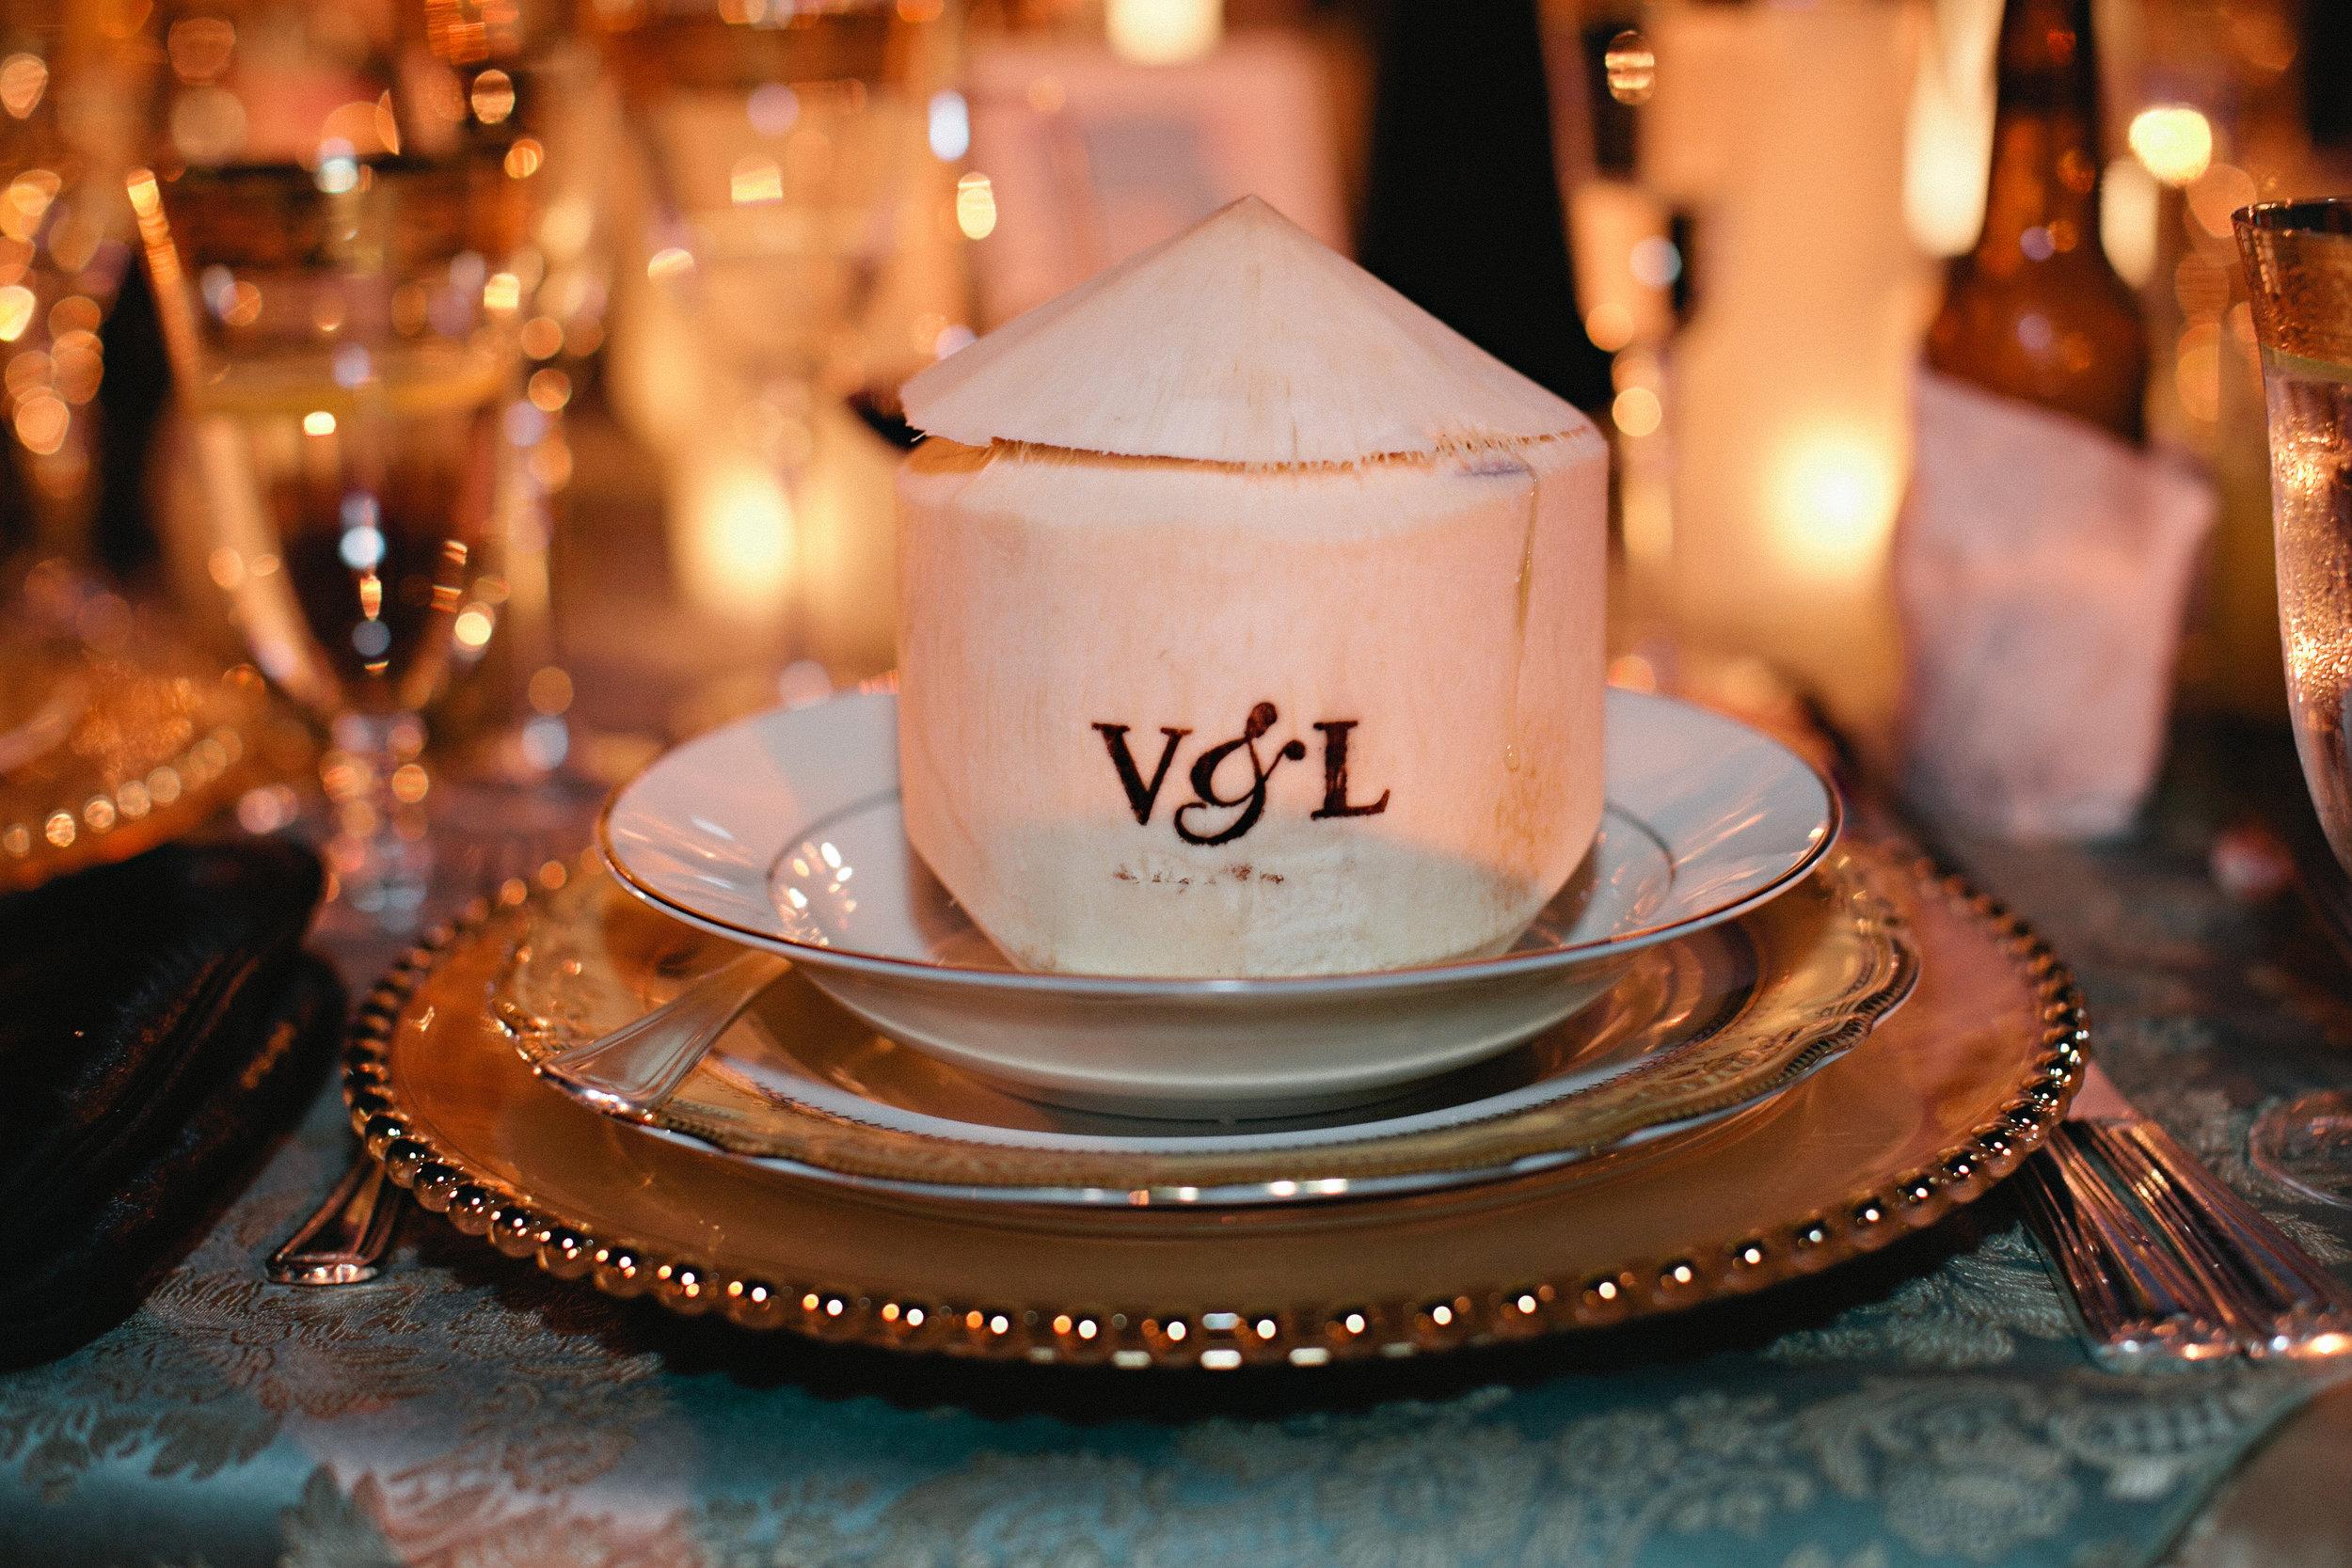 9245_linda_vu_wedding-1617011280-O.jpg